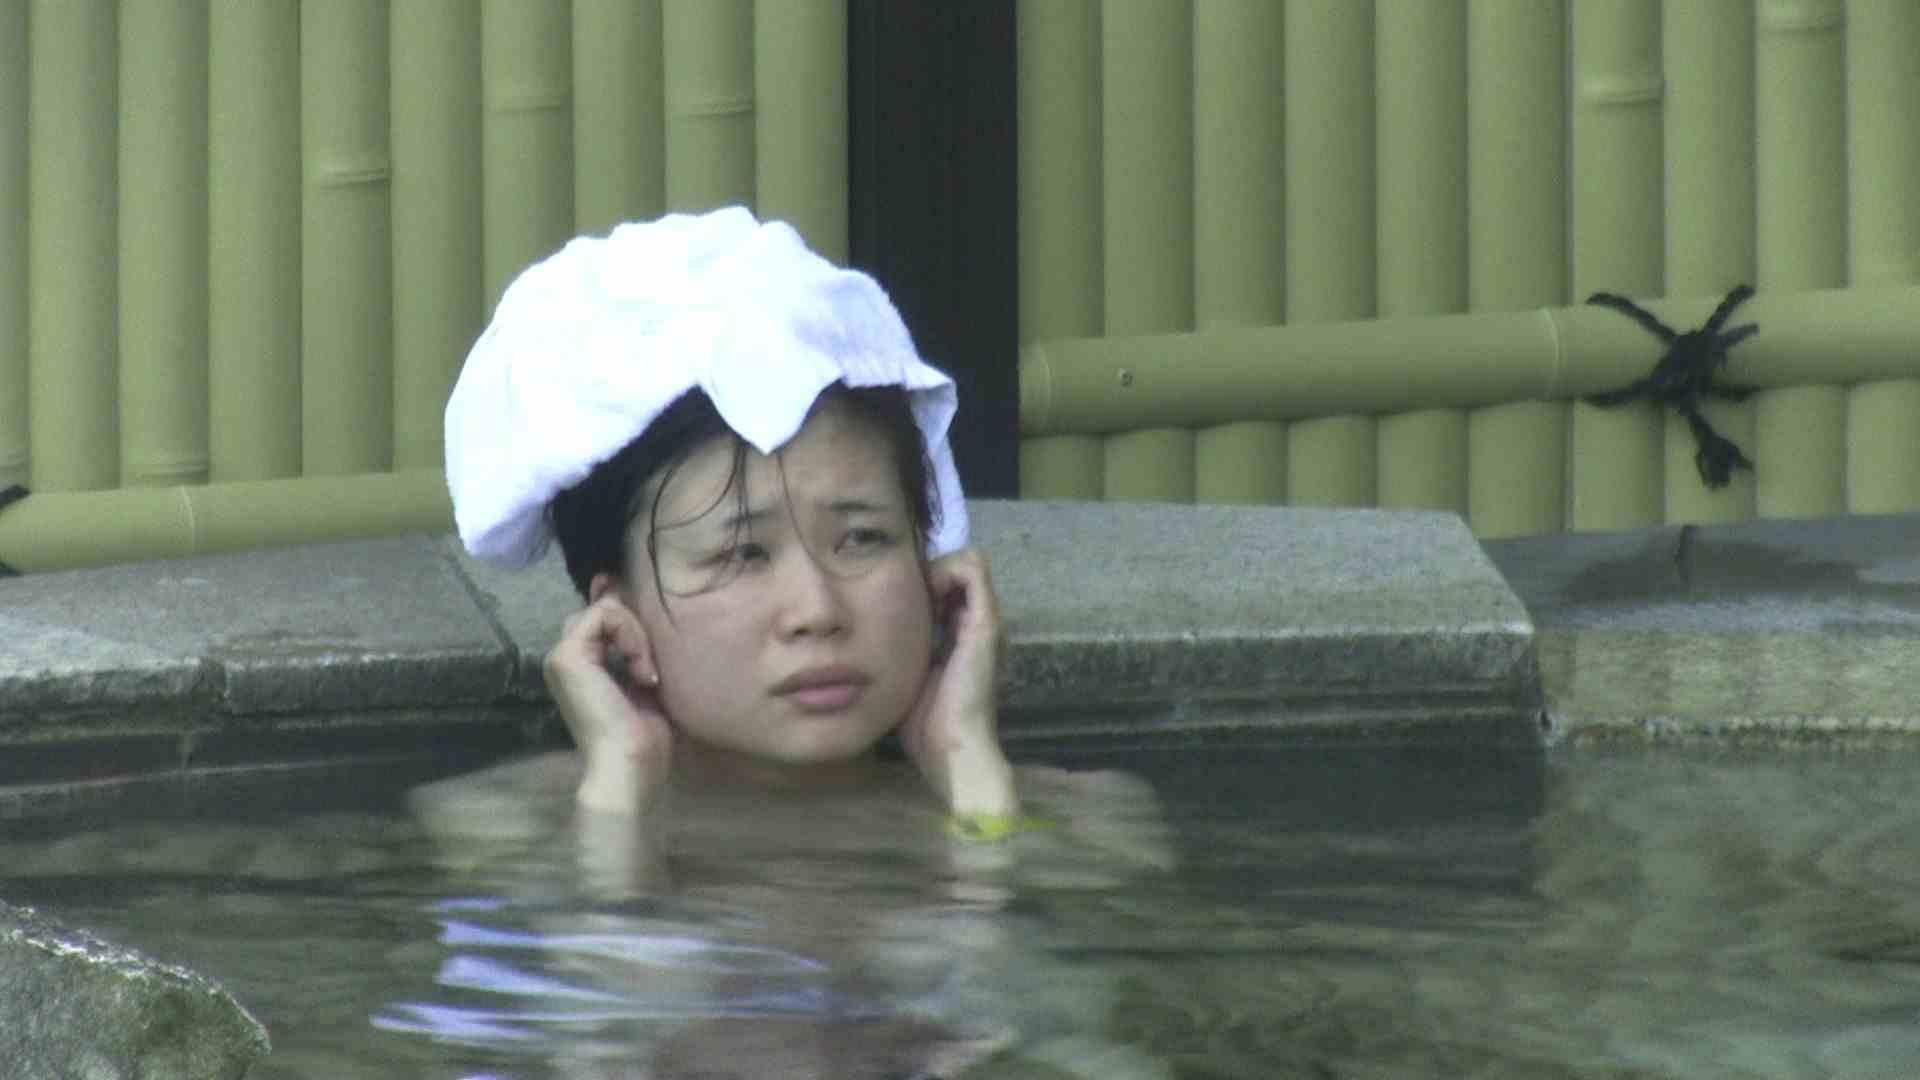 Aquaな露天風呂Vol.183 美しいOLの裸体   露天風呂突入  105pic 67